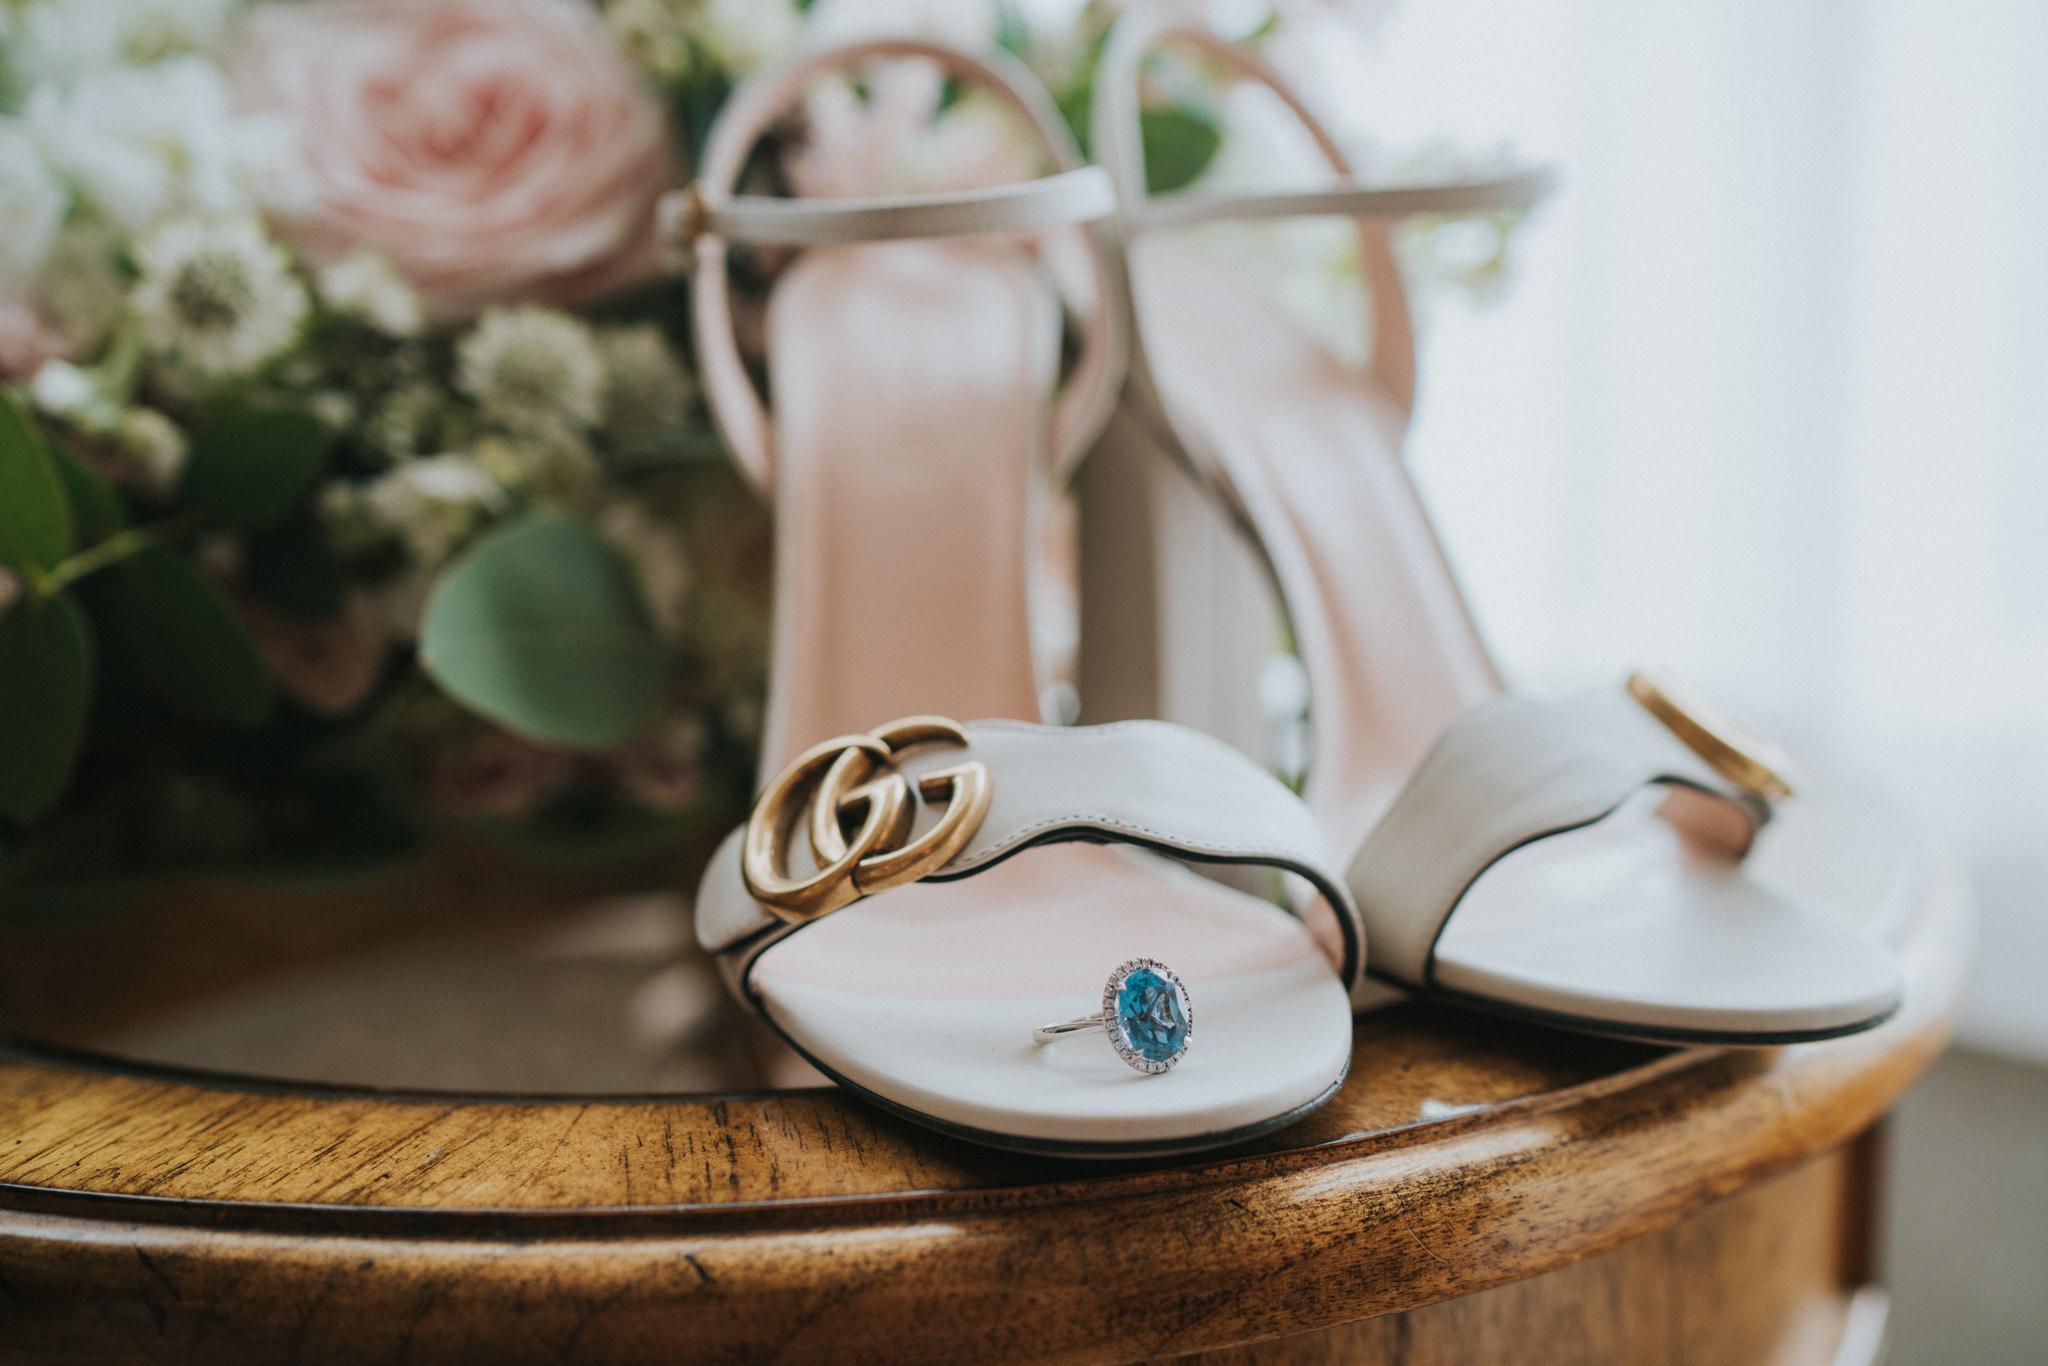 Sarah-Alex-Wivenhoe-House-St-Osyth-Church-Intimate-Wedding-Grace-Elizabeth-Colchester-Essex-Alternative-Wedding-Lifestyle-Photographer (3 of 11).jpg